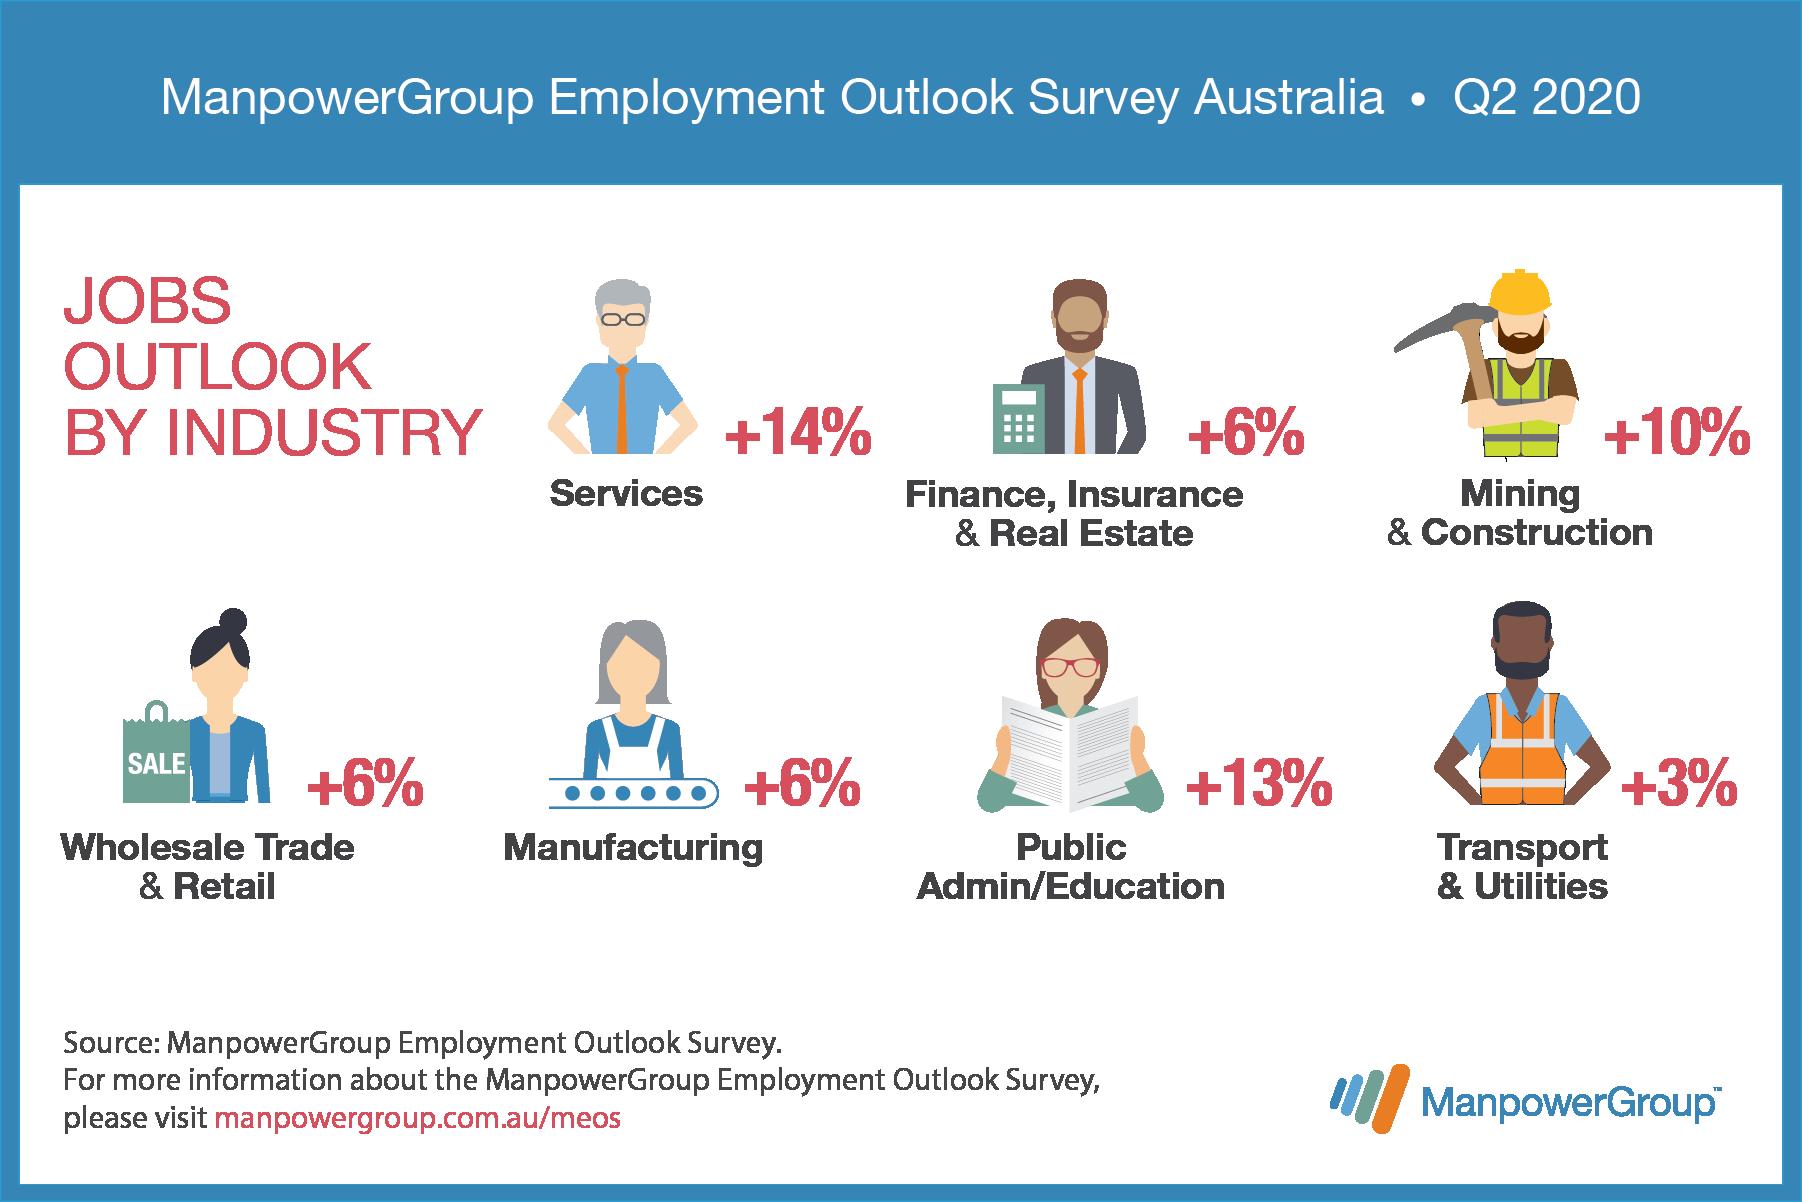 MEOS_Q2_Jobs_outlook_industry_Li_1800x1200_AU-4